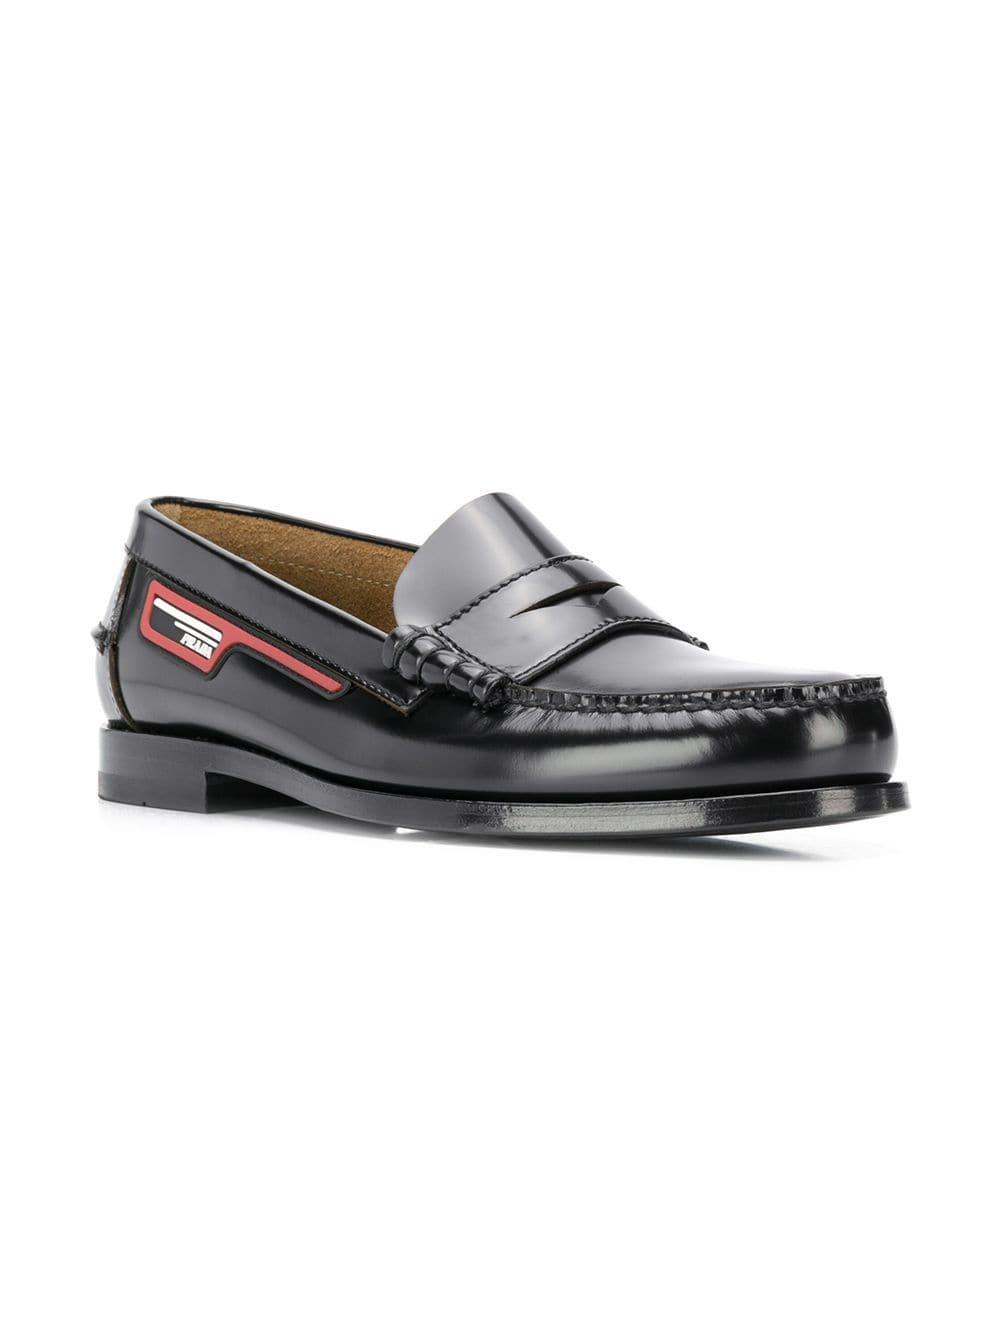 37dd951b9fa Prada Portuguese Patch Loafers in Black for Men - Lyst